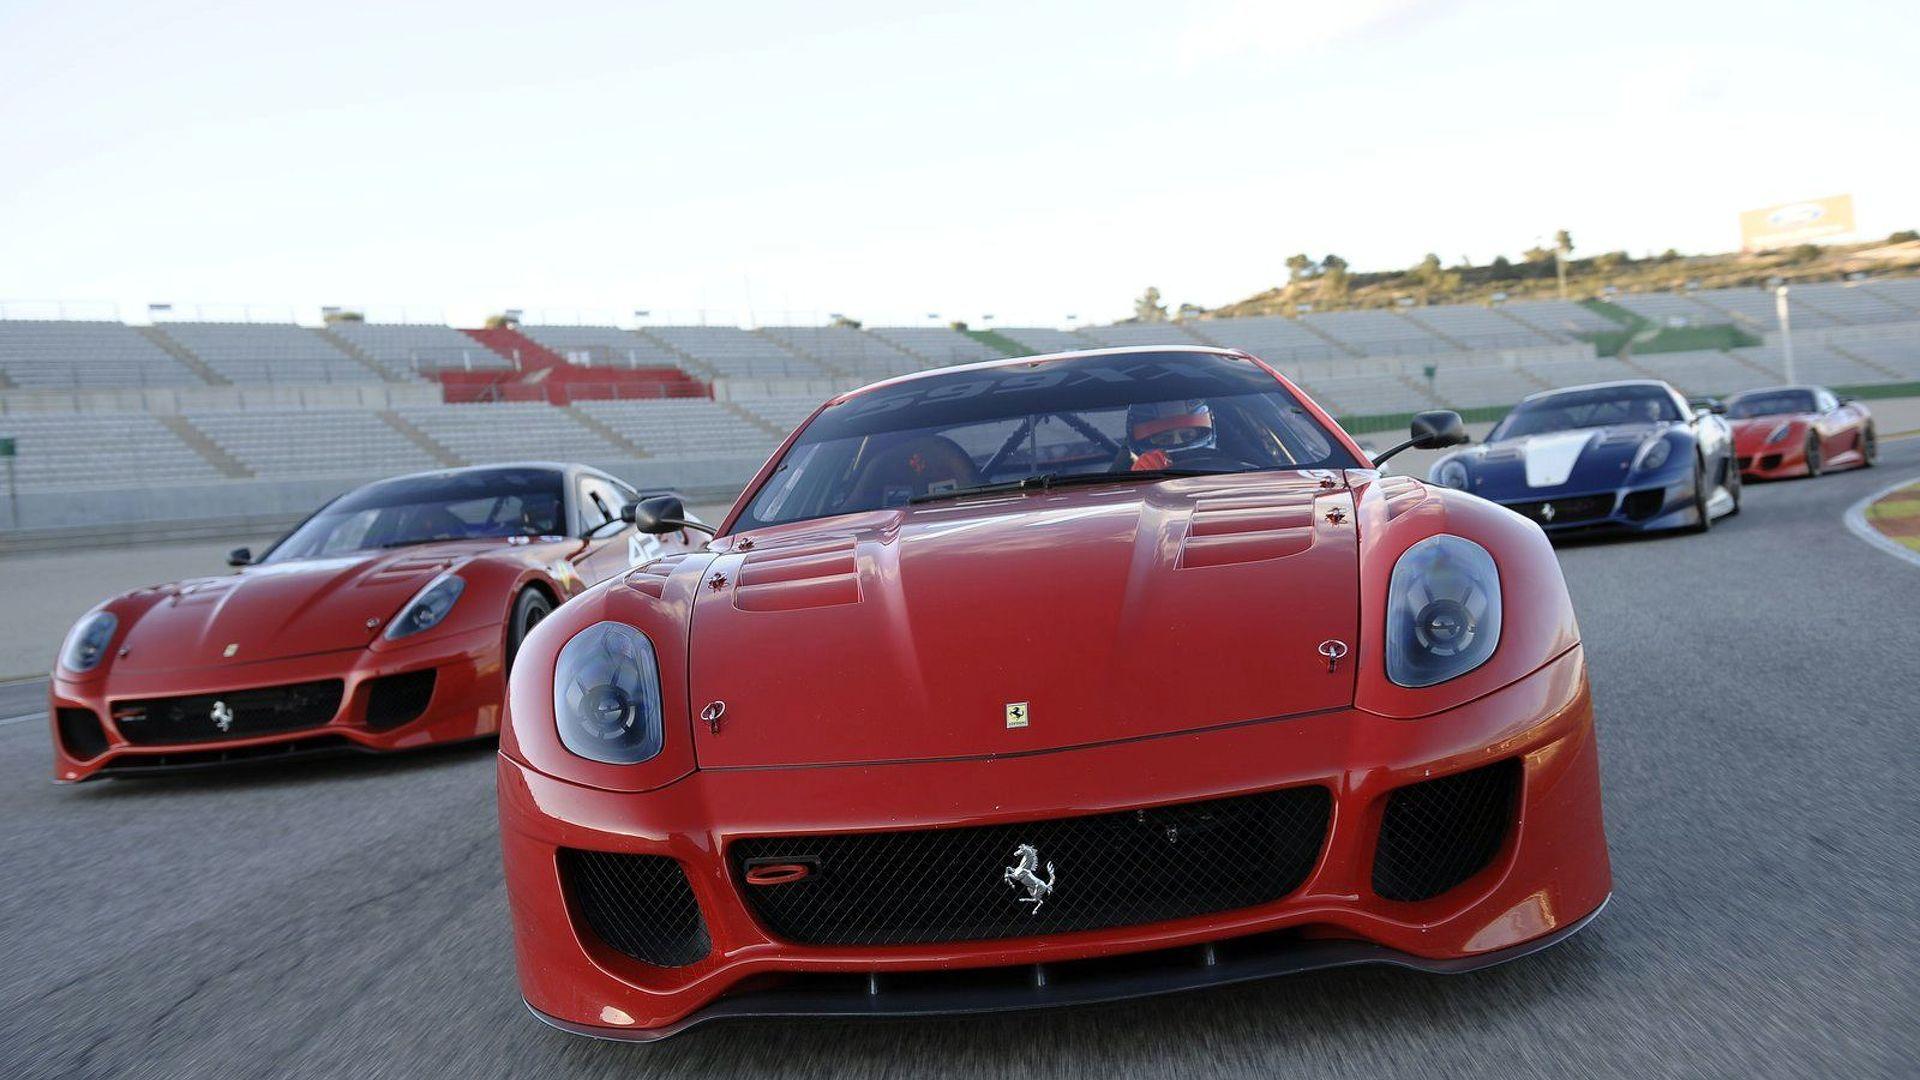 Ferrari to auction 599xx evo for earthquake victims ferrari to auction 599xx evo for earthquake victims product 2012 05 31 171206 vanachro Gallery